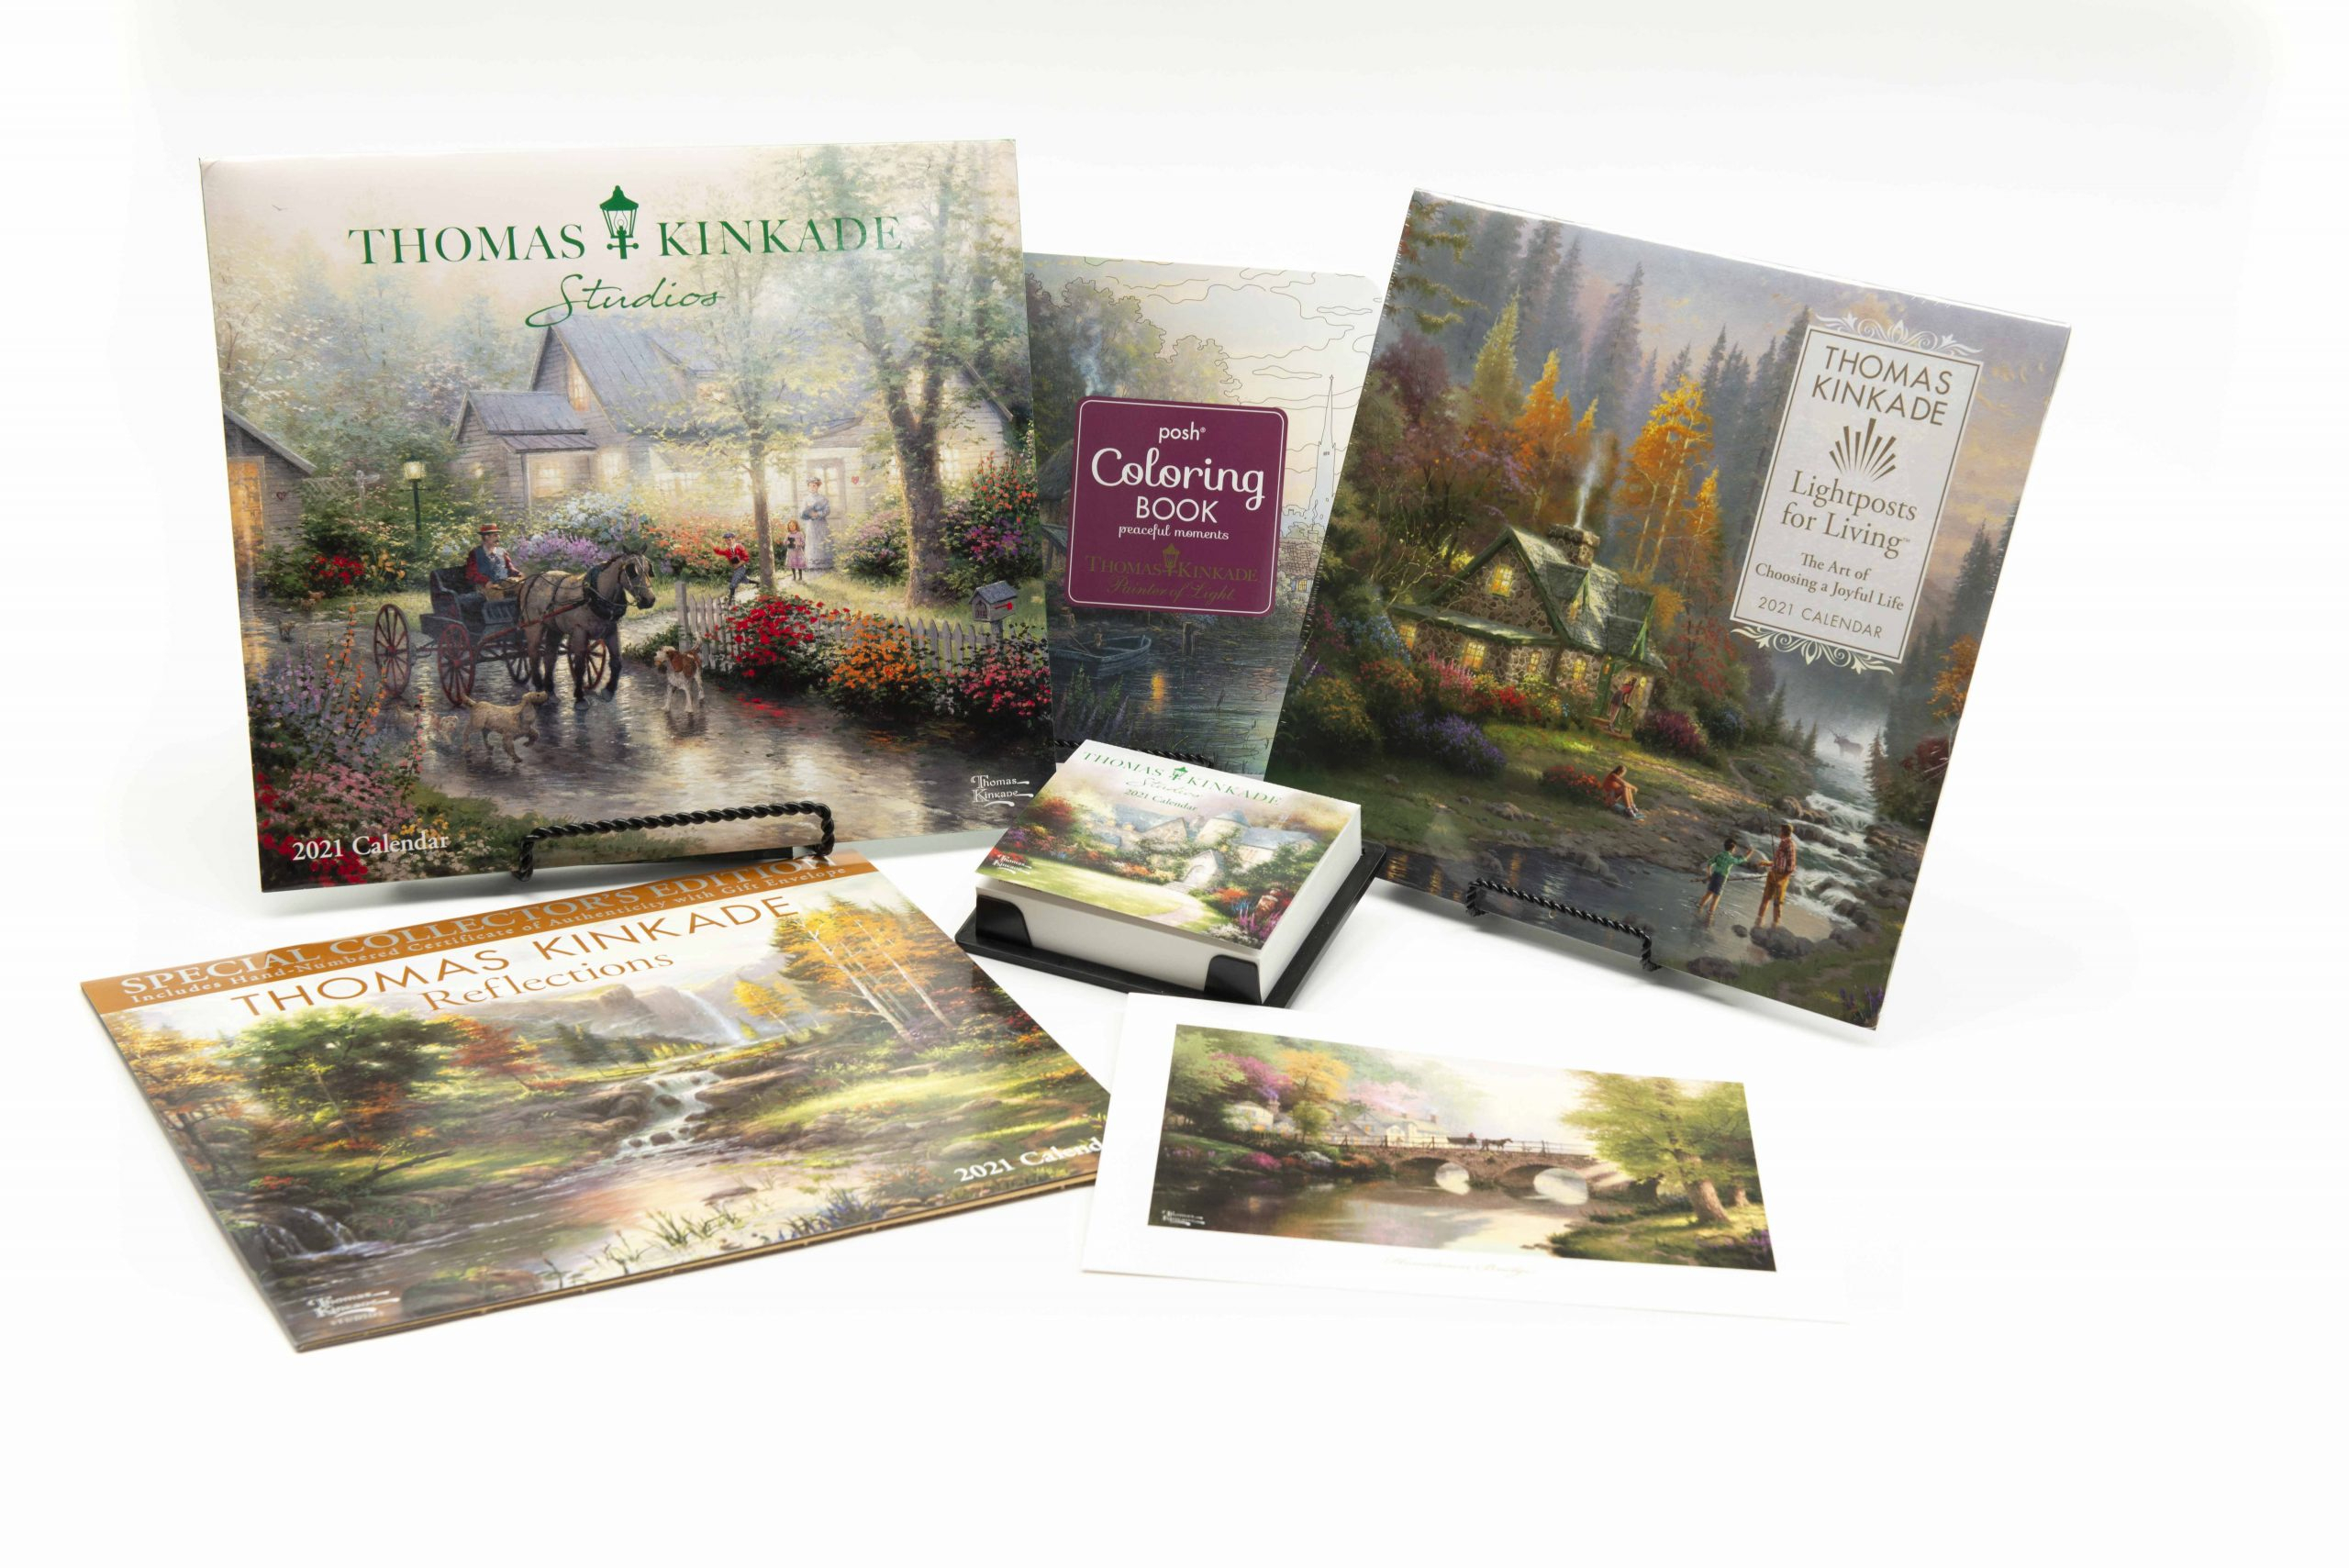 2021 Thomas Kinkade Scriptures Calendar Like Contest throughout Free Hallmark Pocket Calendars